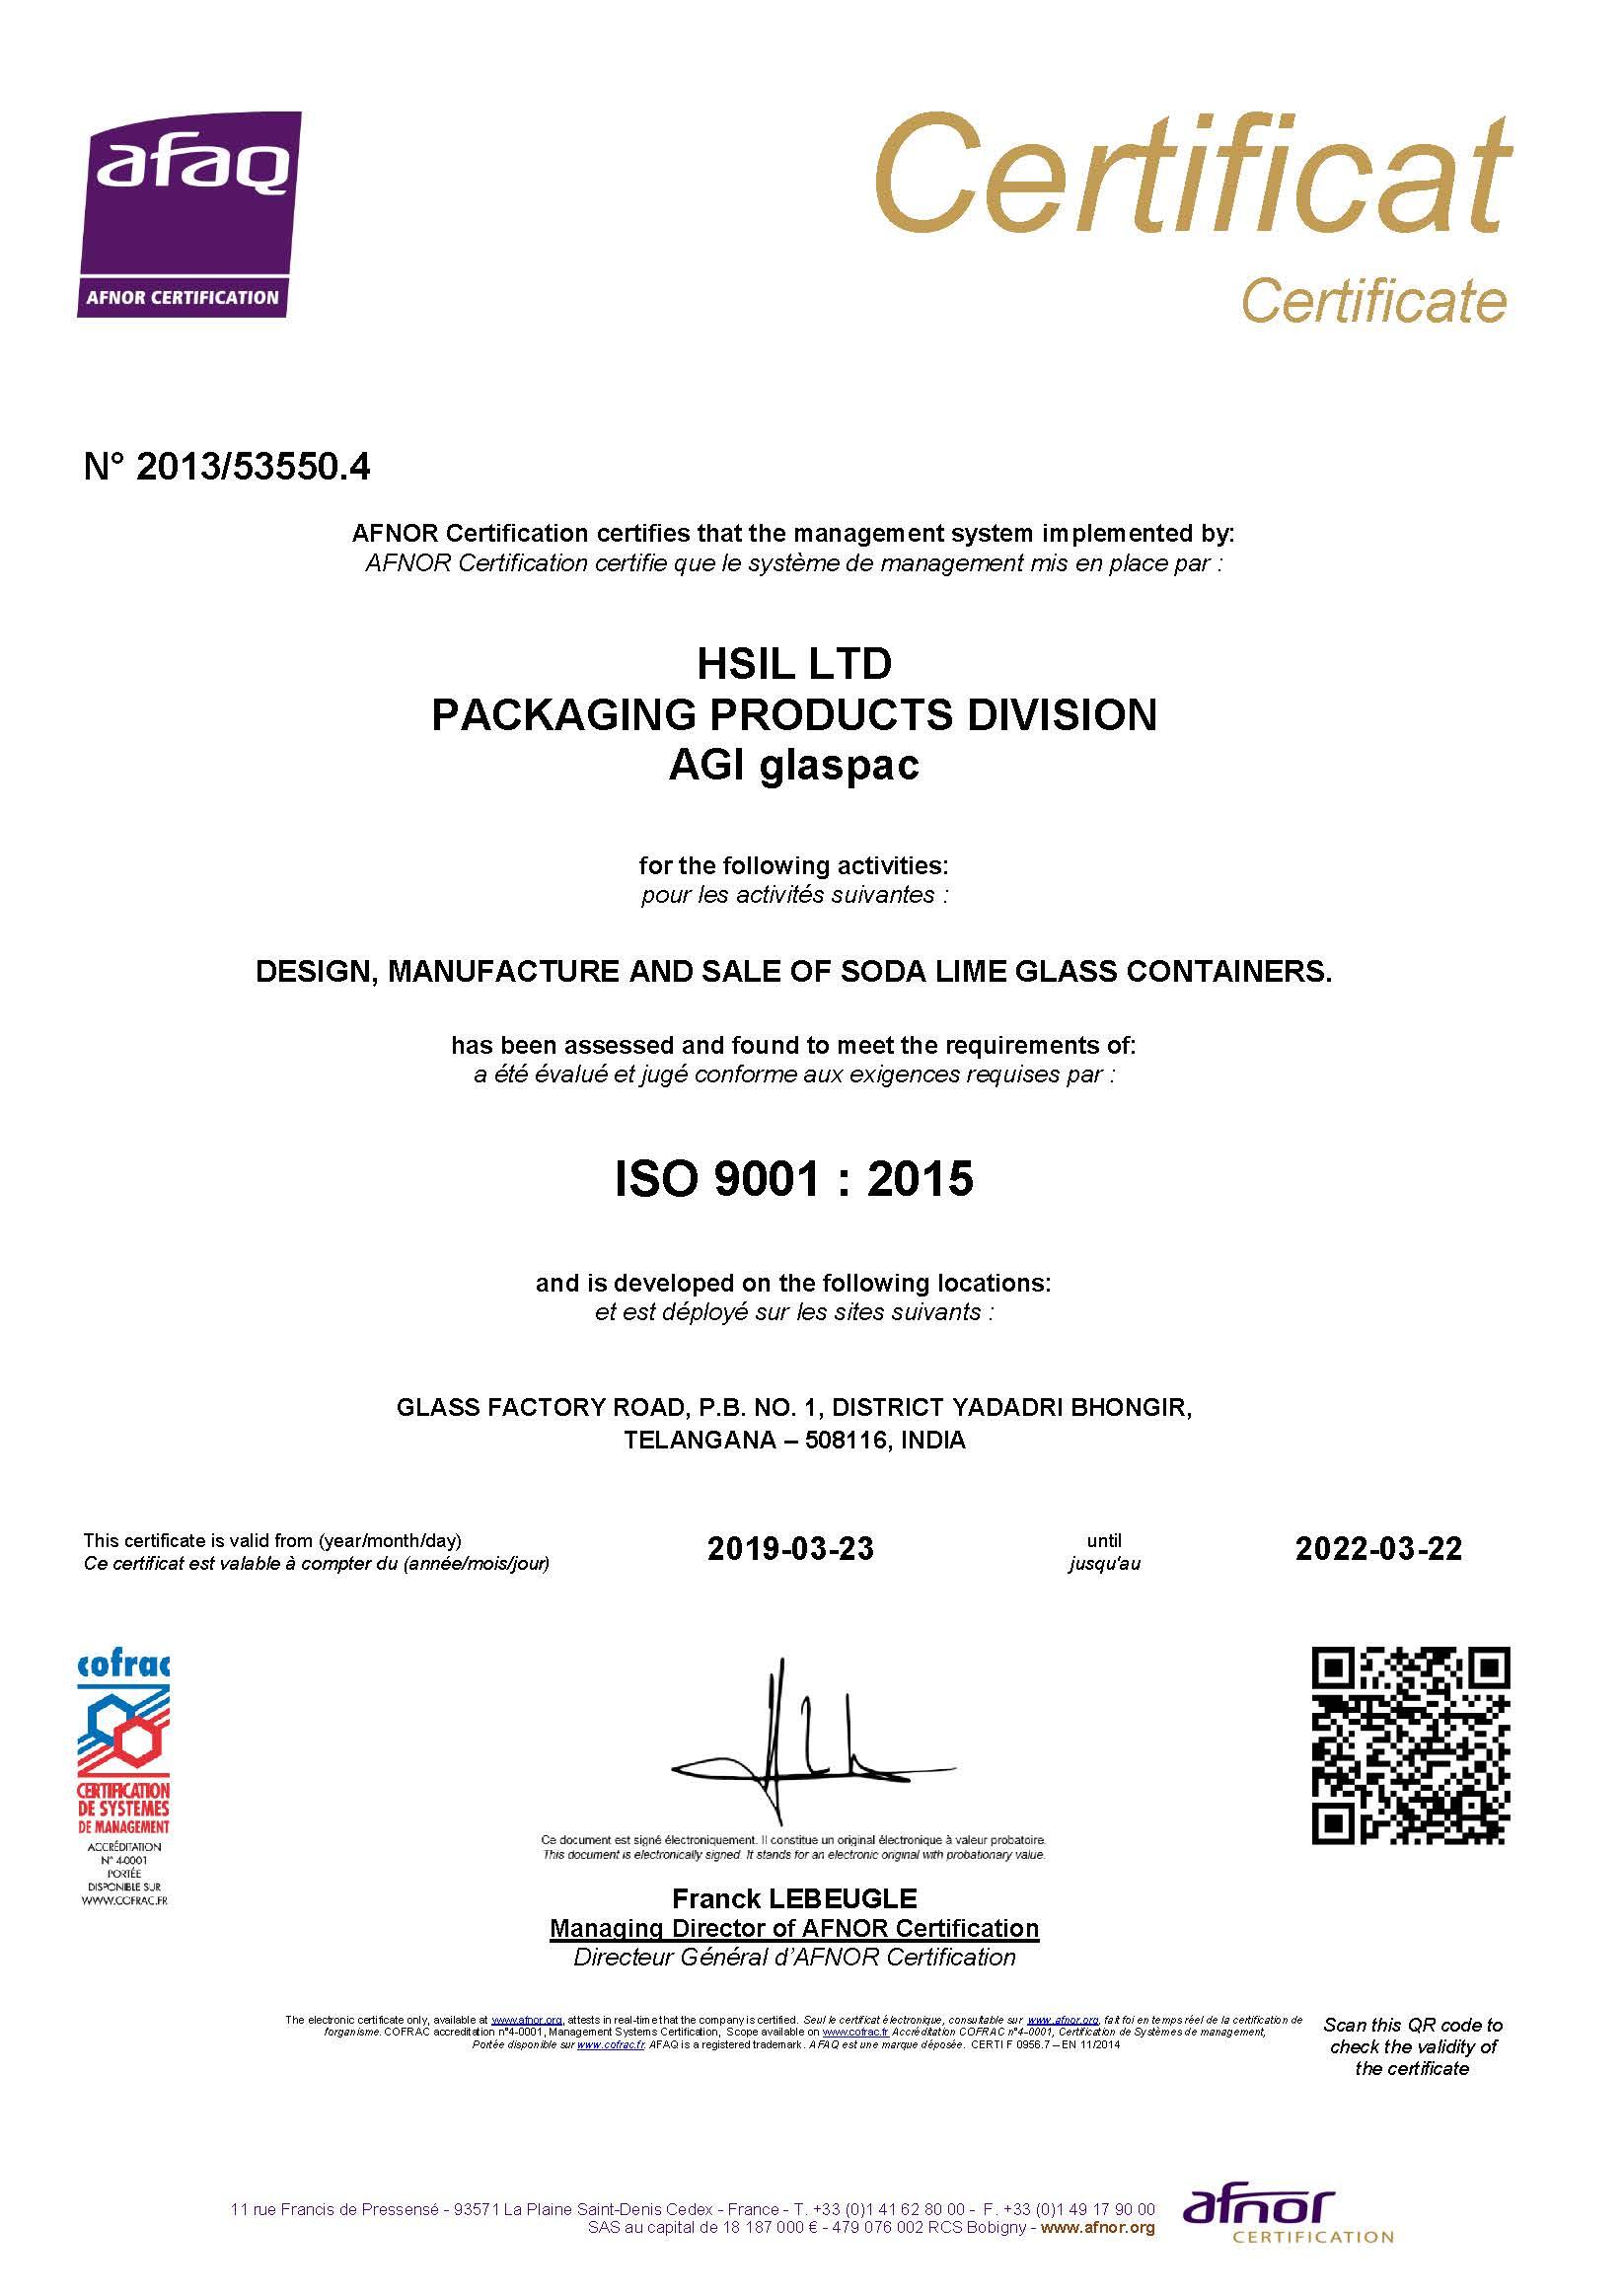 bgr certificate 2